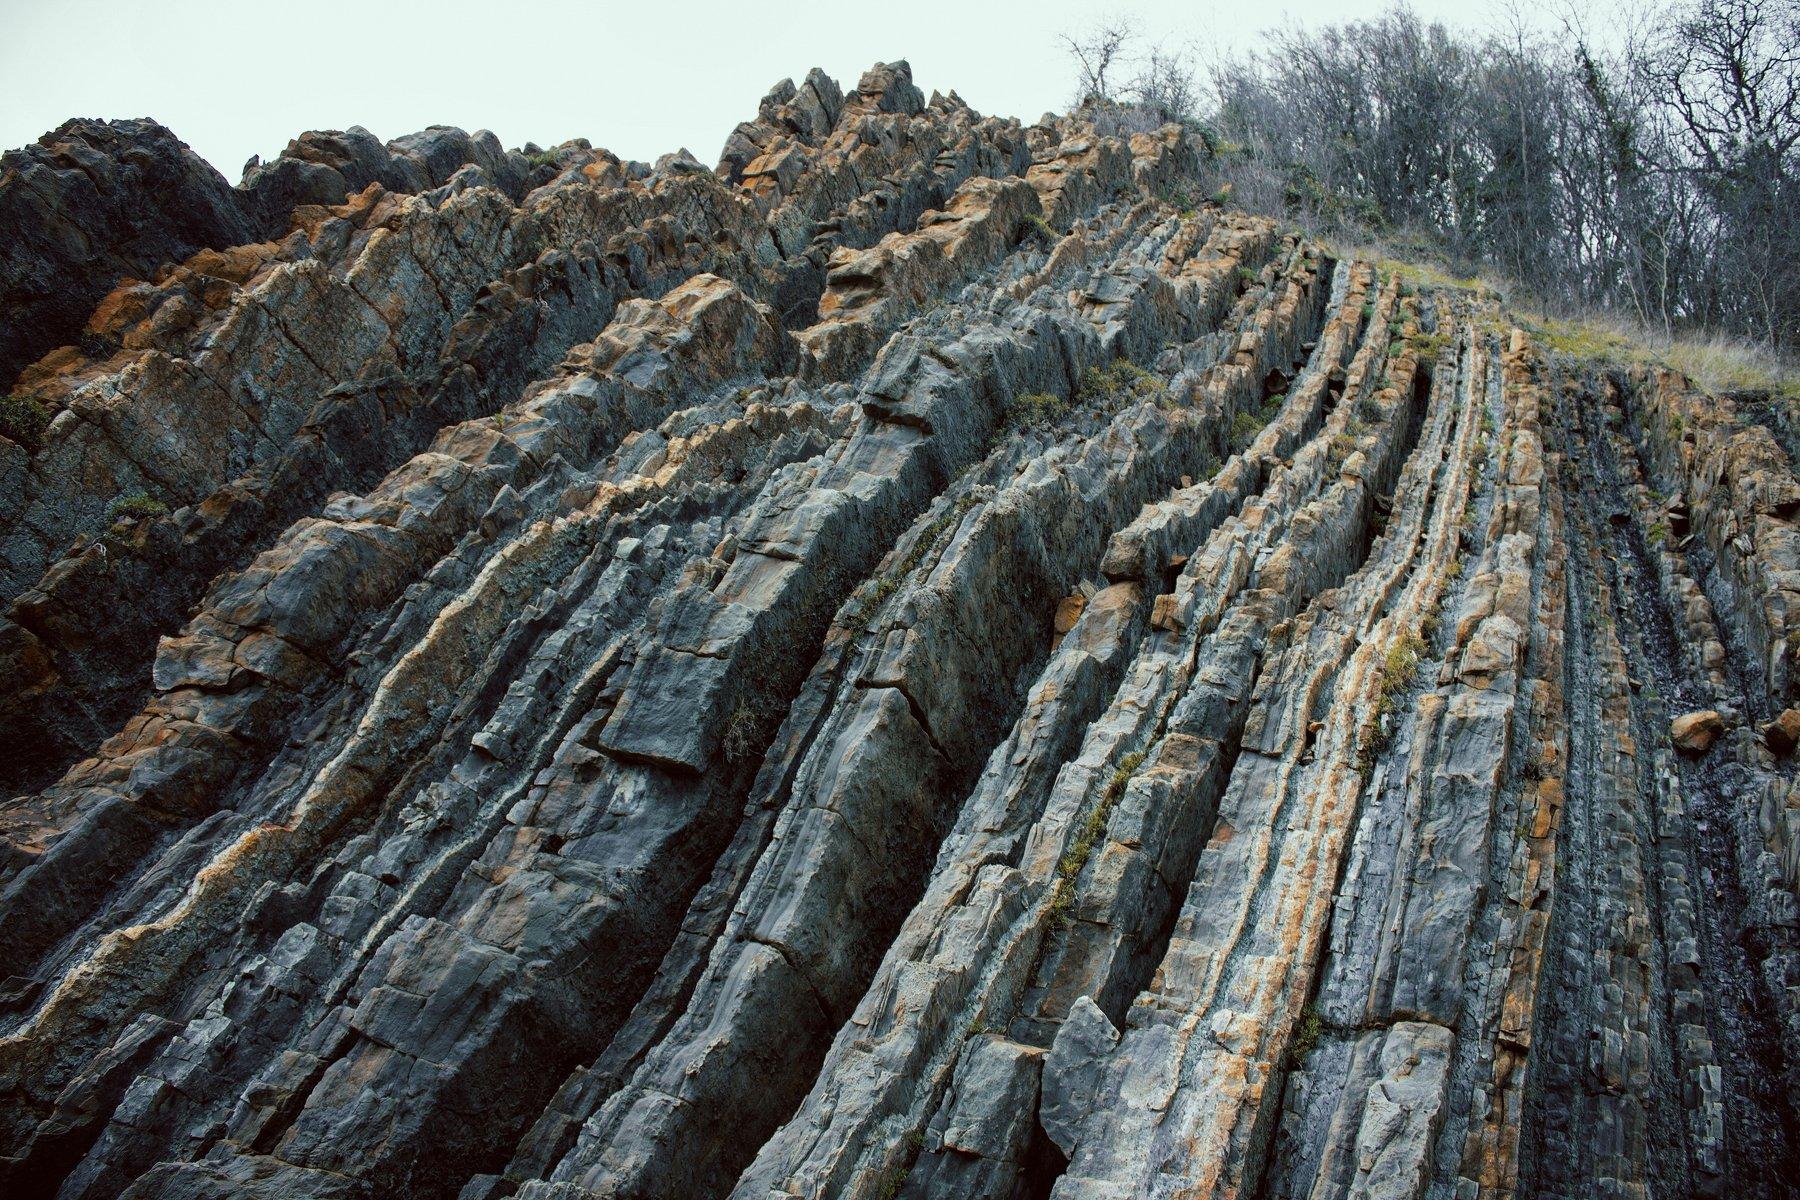 камень, полосы, скала, скалы, слои, слой, Vladimir Kedrov